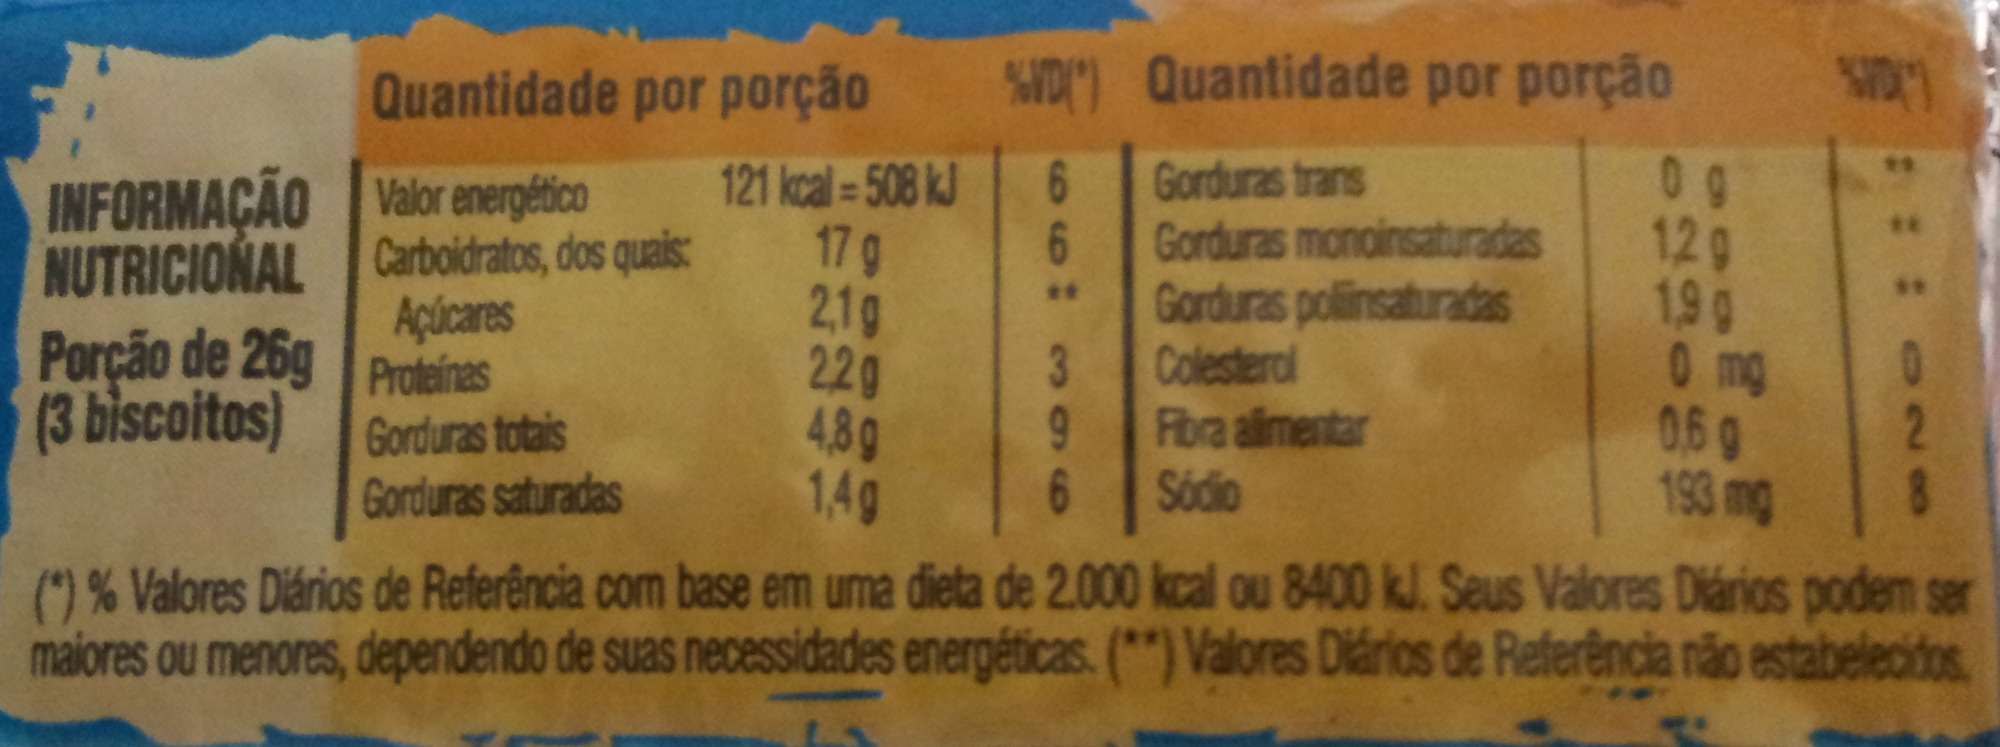 Clube Social Original - Nutrition facts - pt